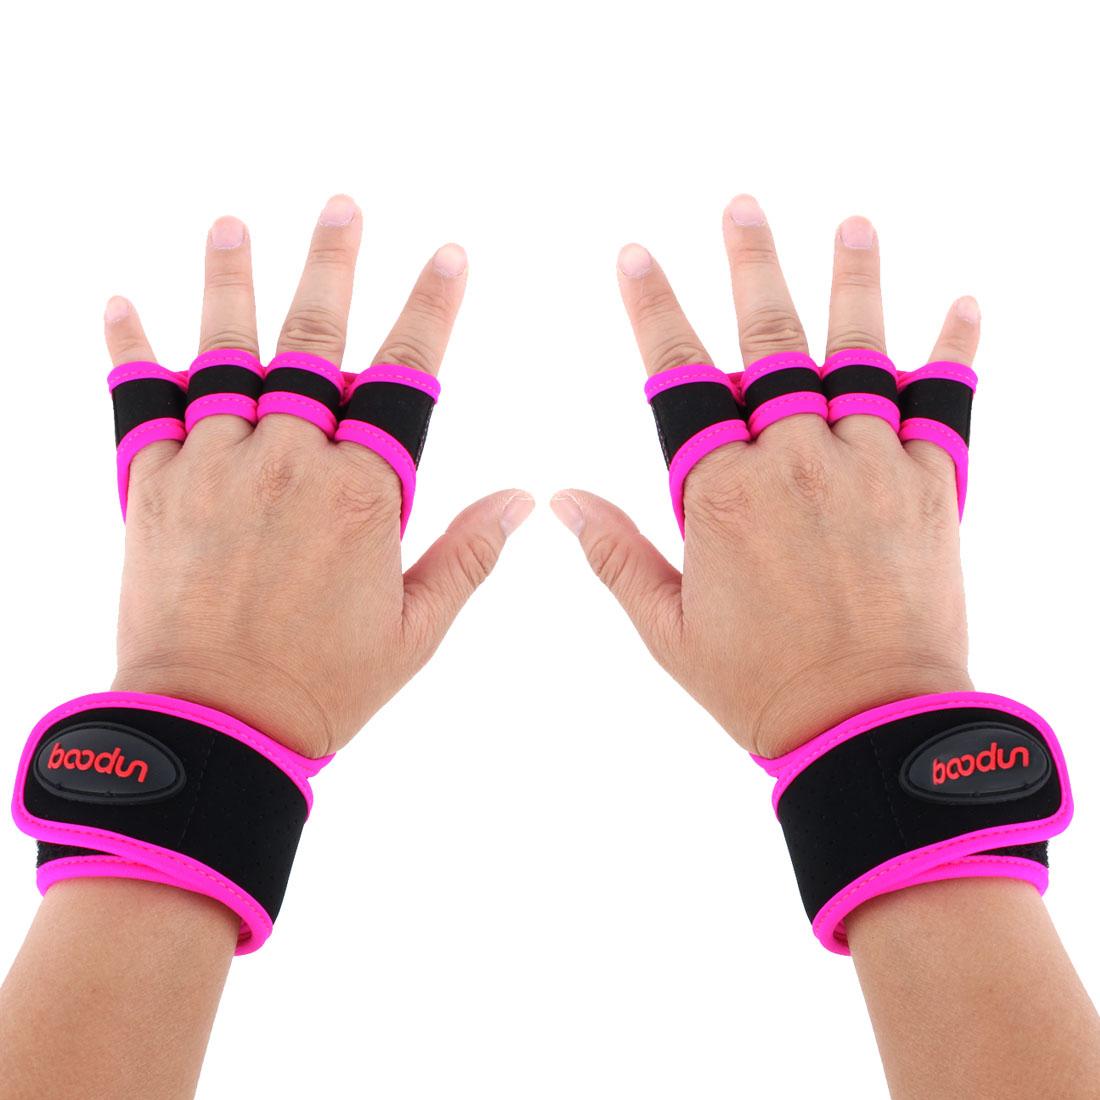 BOODUN Authorized Indoor Workout Training Sports Adjustable Anti Slip Fitness Gloves Fuchsia L Size Pair